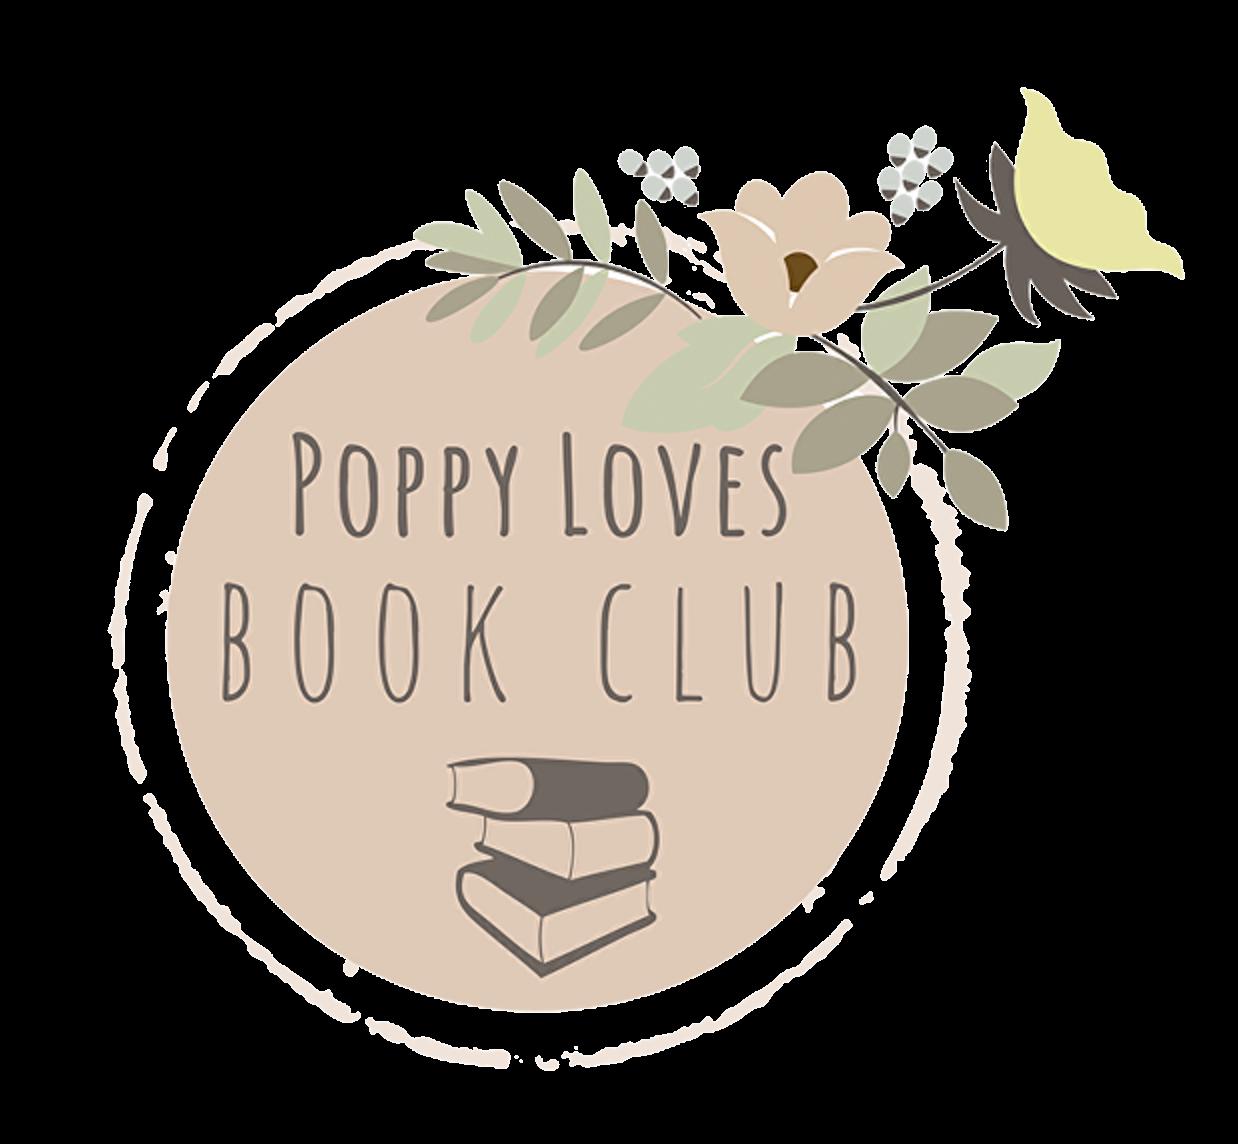 Club clipart womens book. Poppy loves